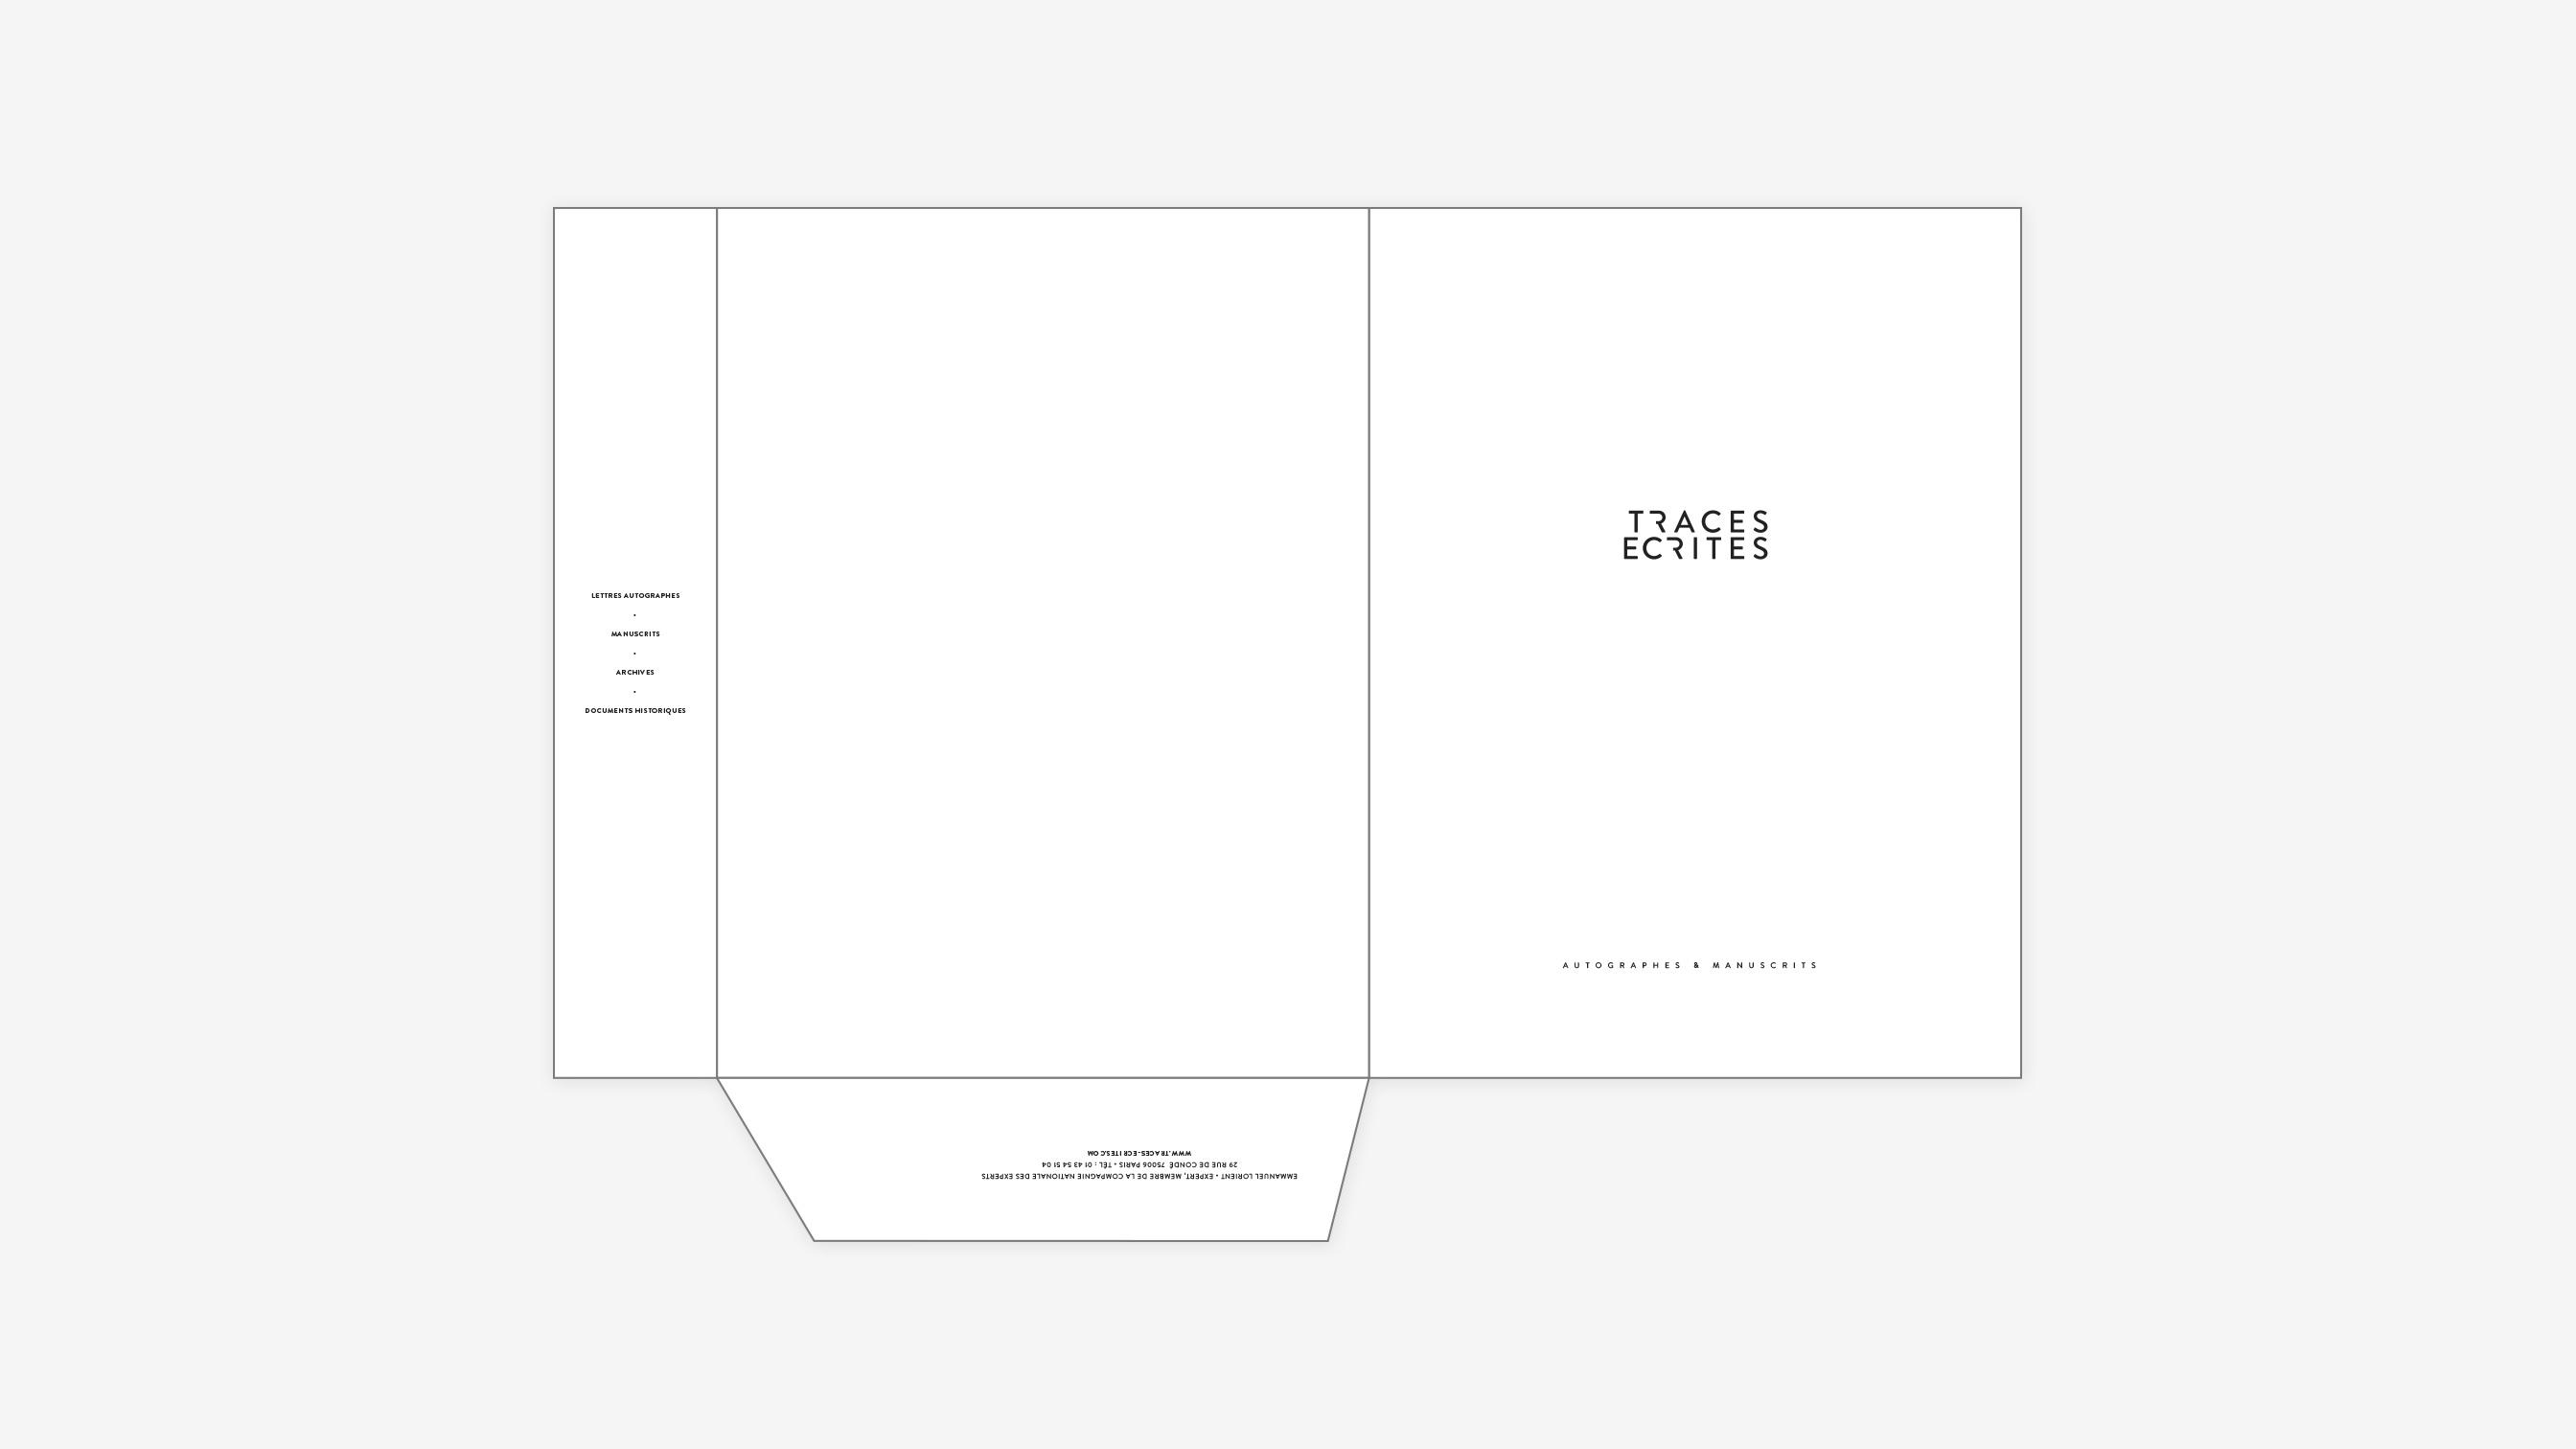 07-traces-ecrites-pikteo-webdesign-graphic-design-freelance-paris-bruxelles-londres